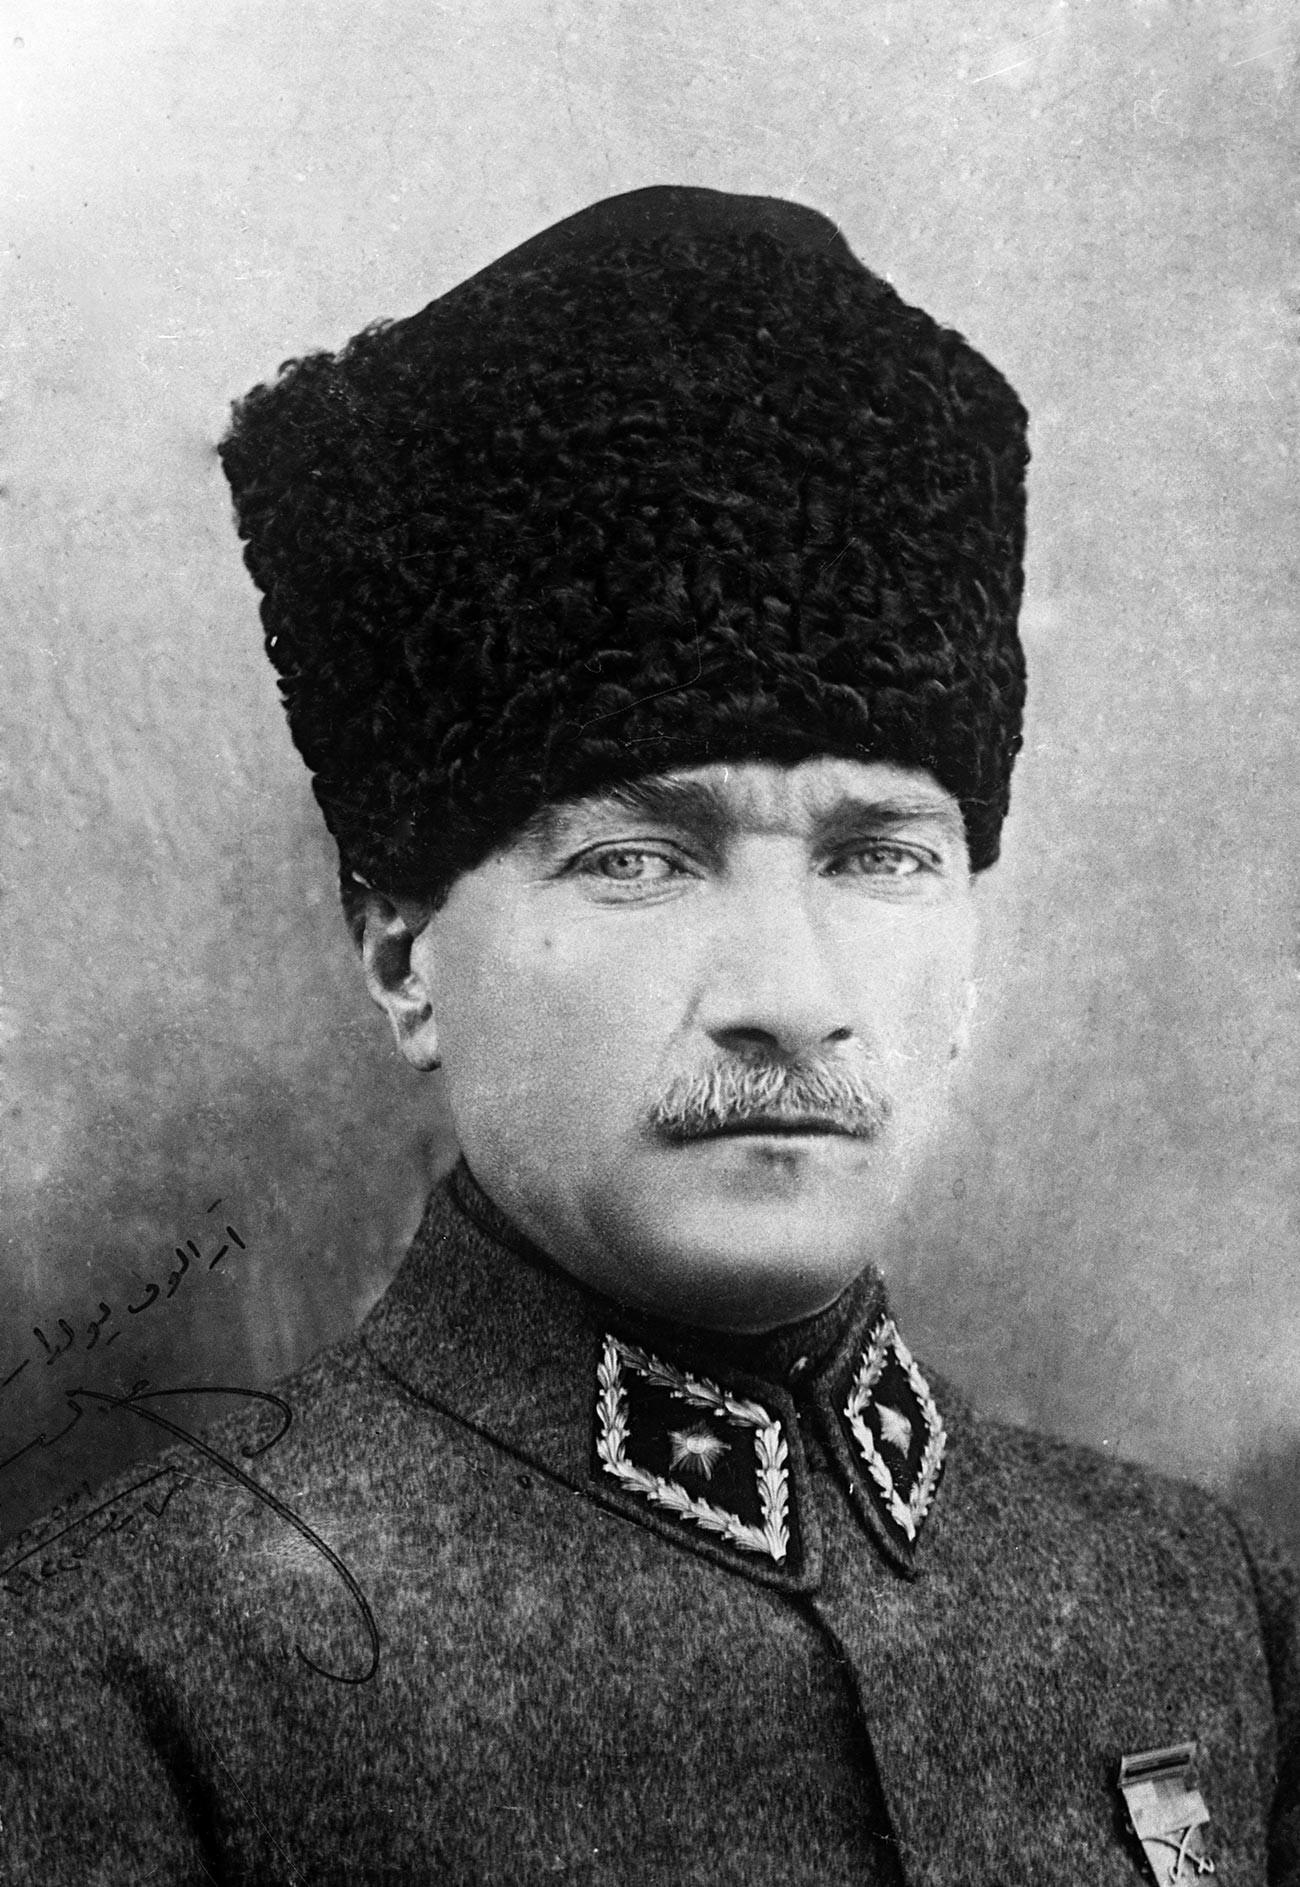 Портрет на Ататюрк